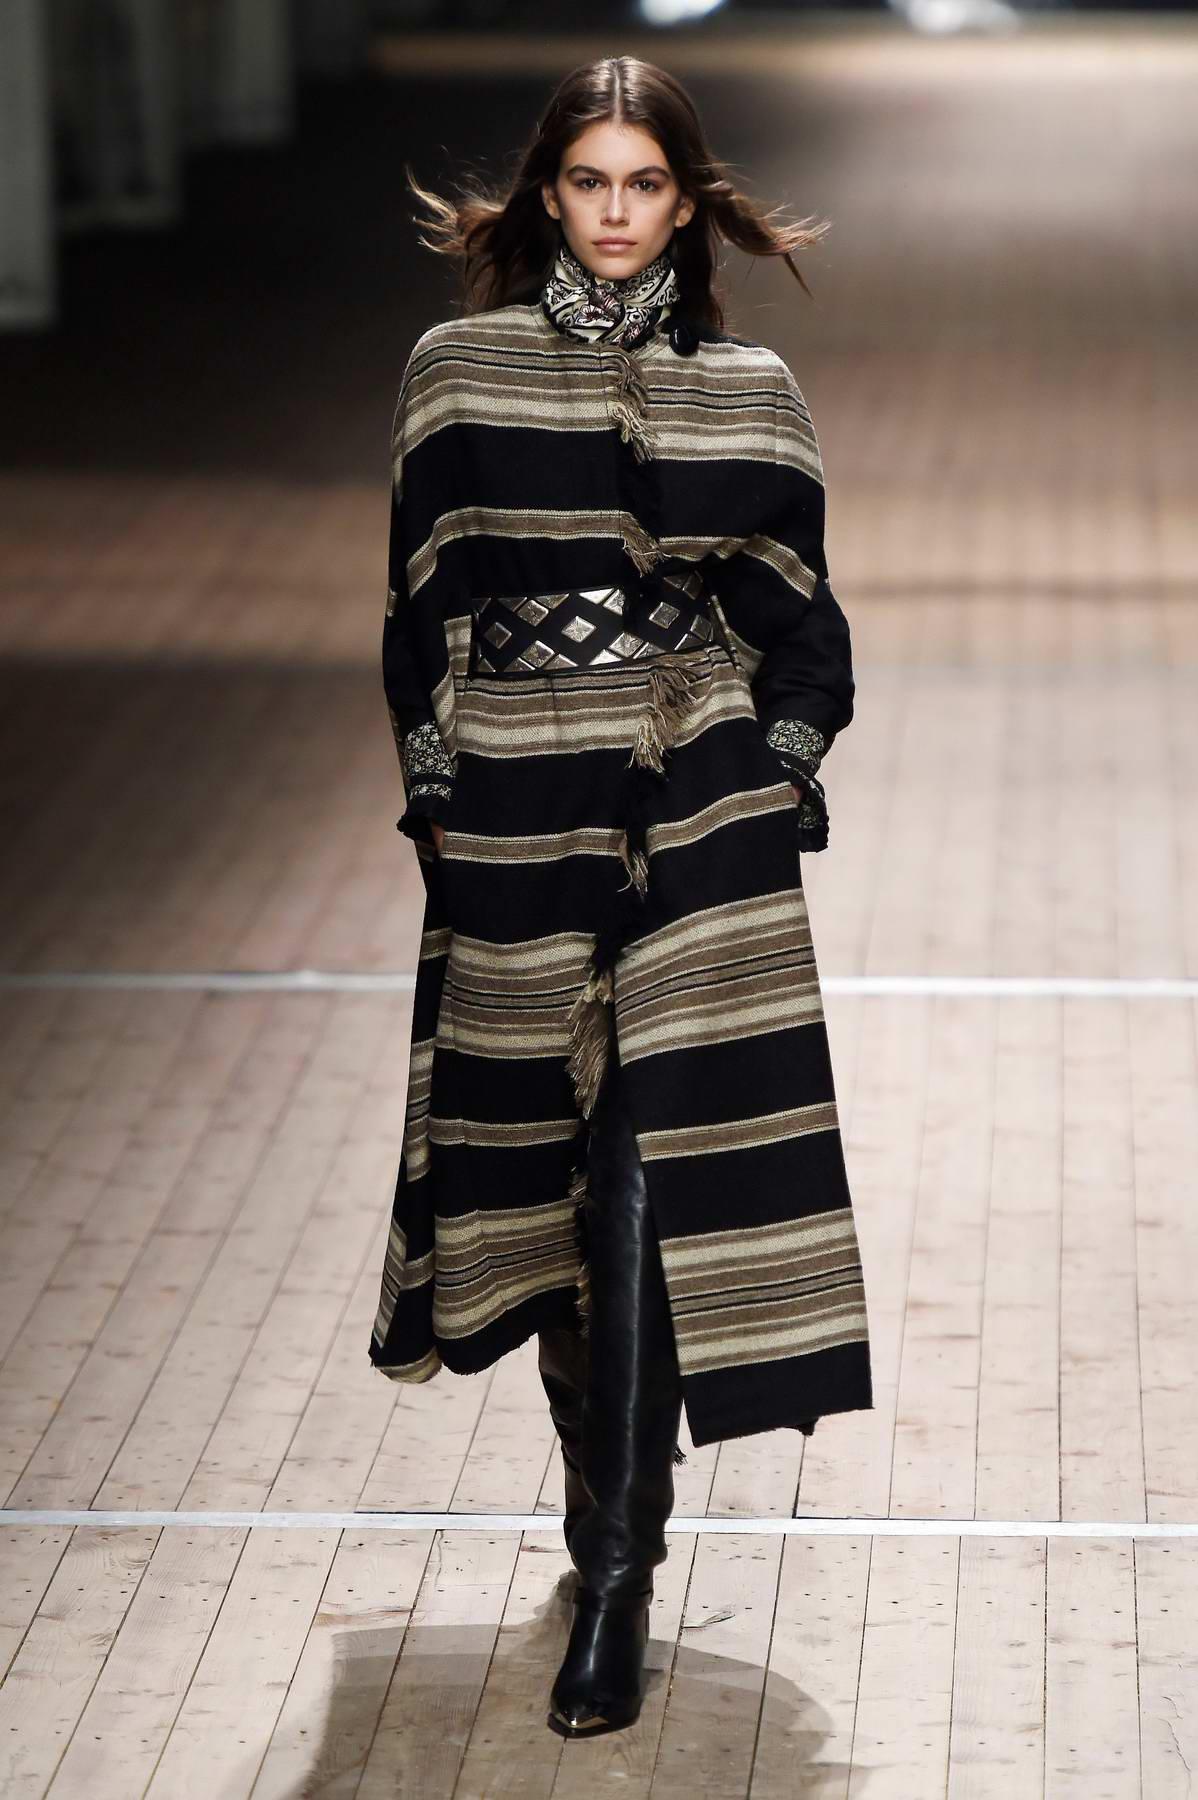 Kaia Gerber walks for Isabel Marant Show during Paris Fashion Week, France